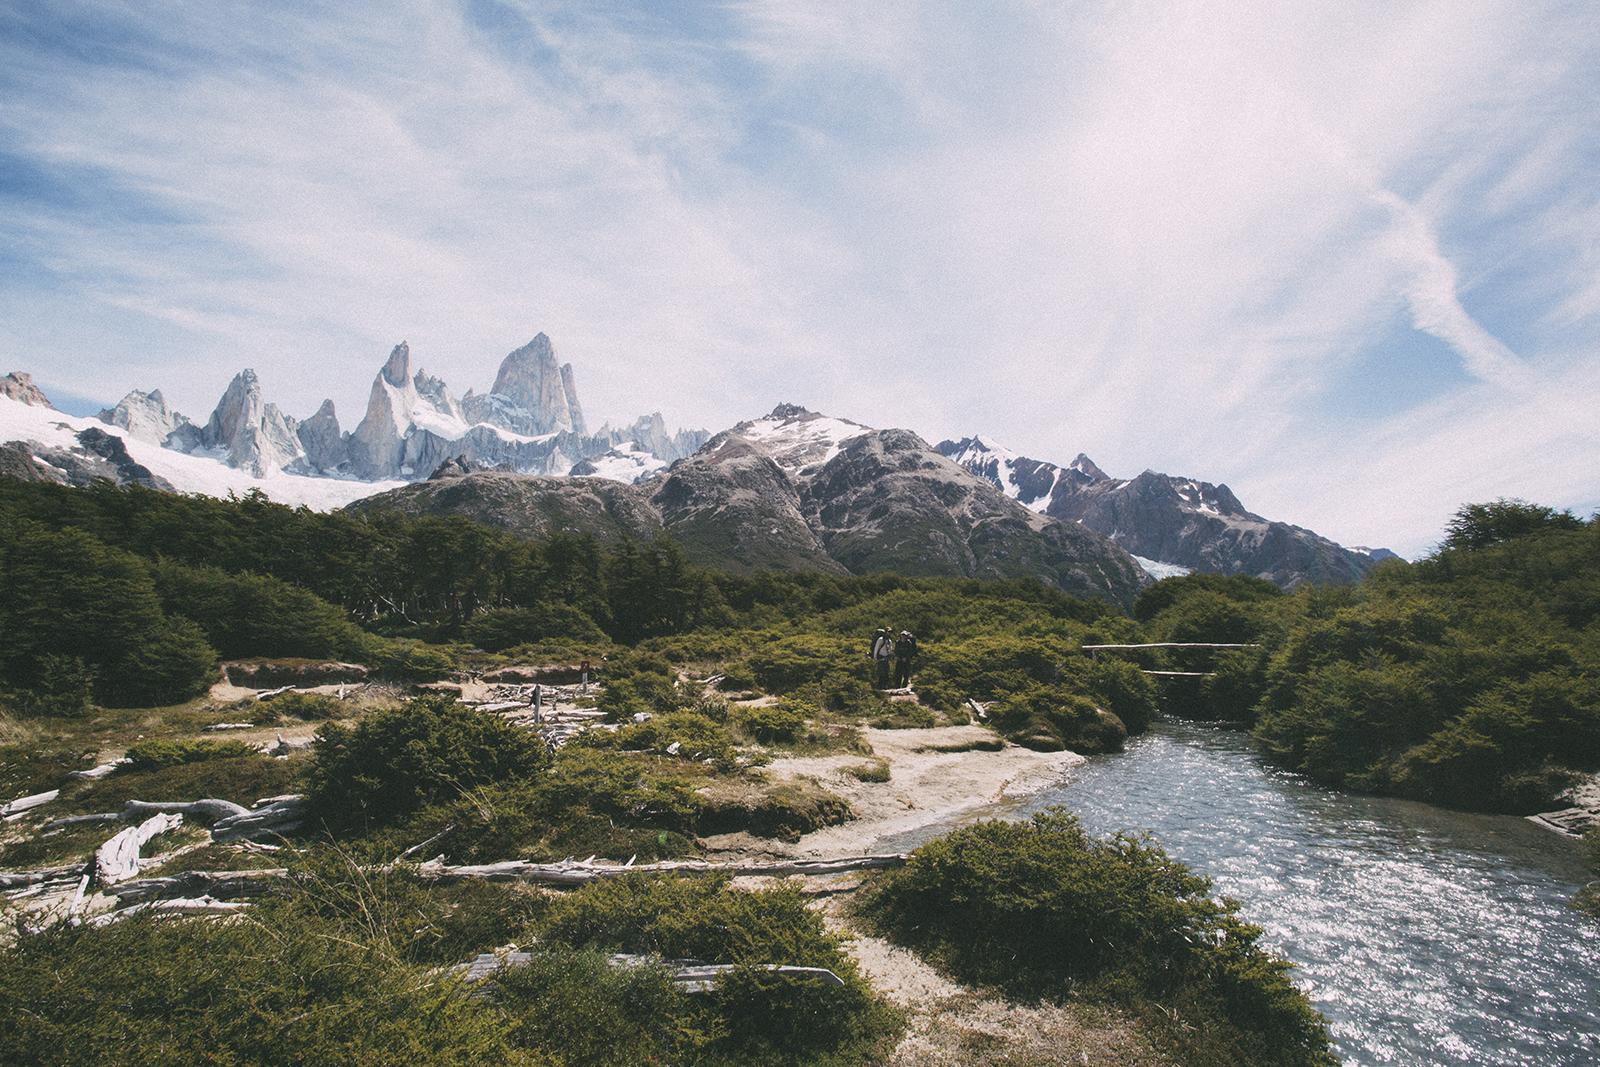 patagonija ivana varesko